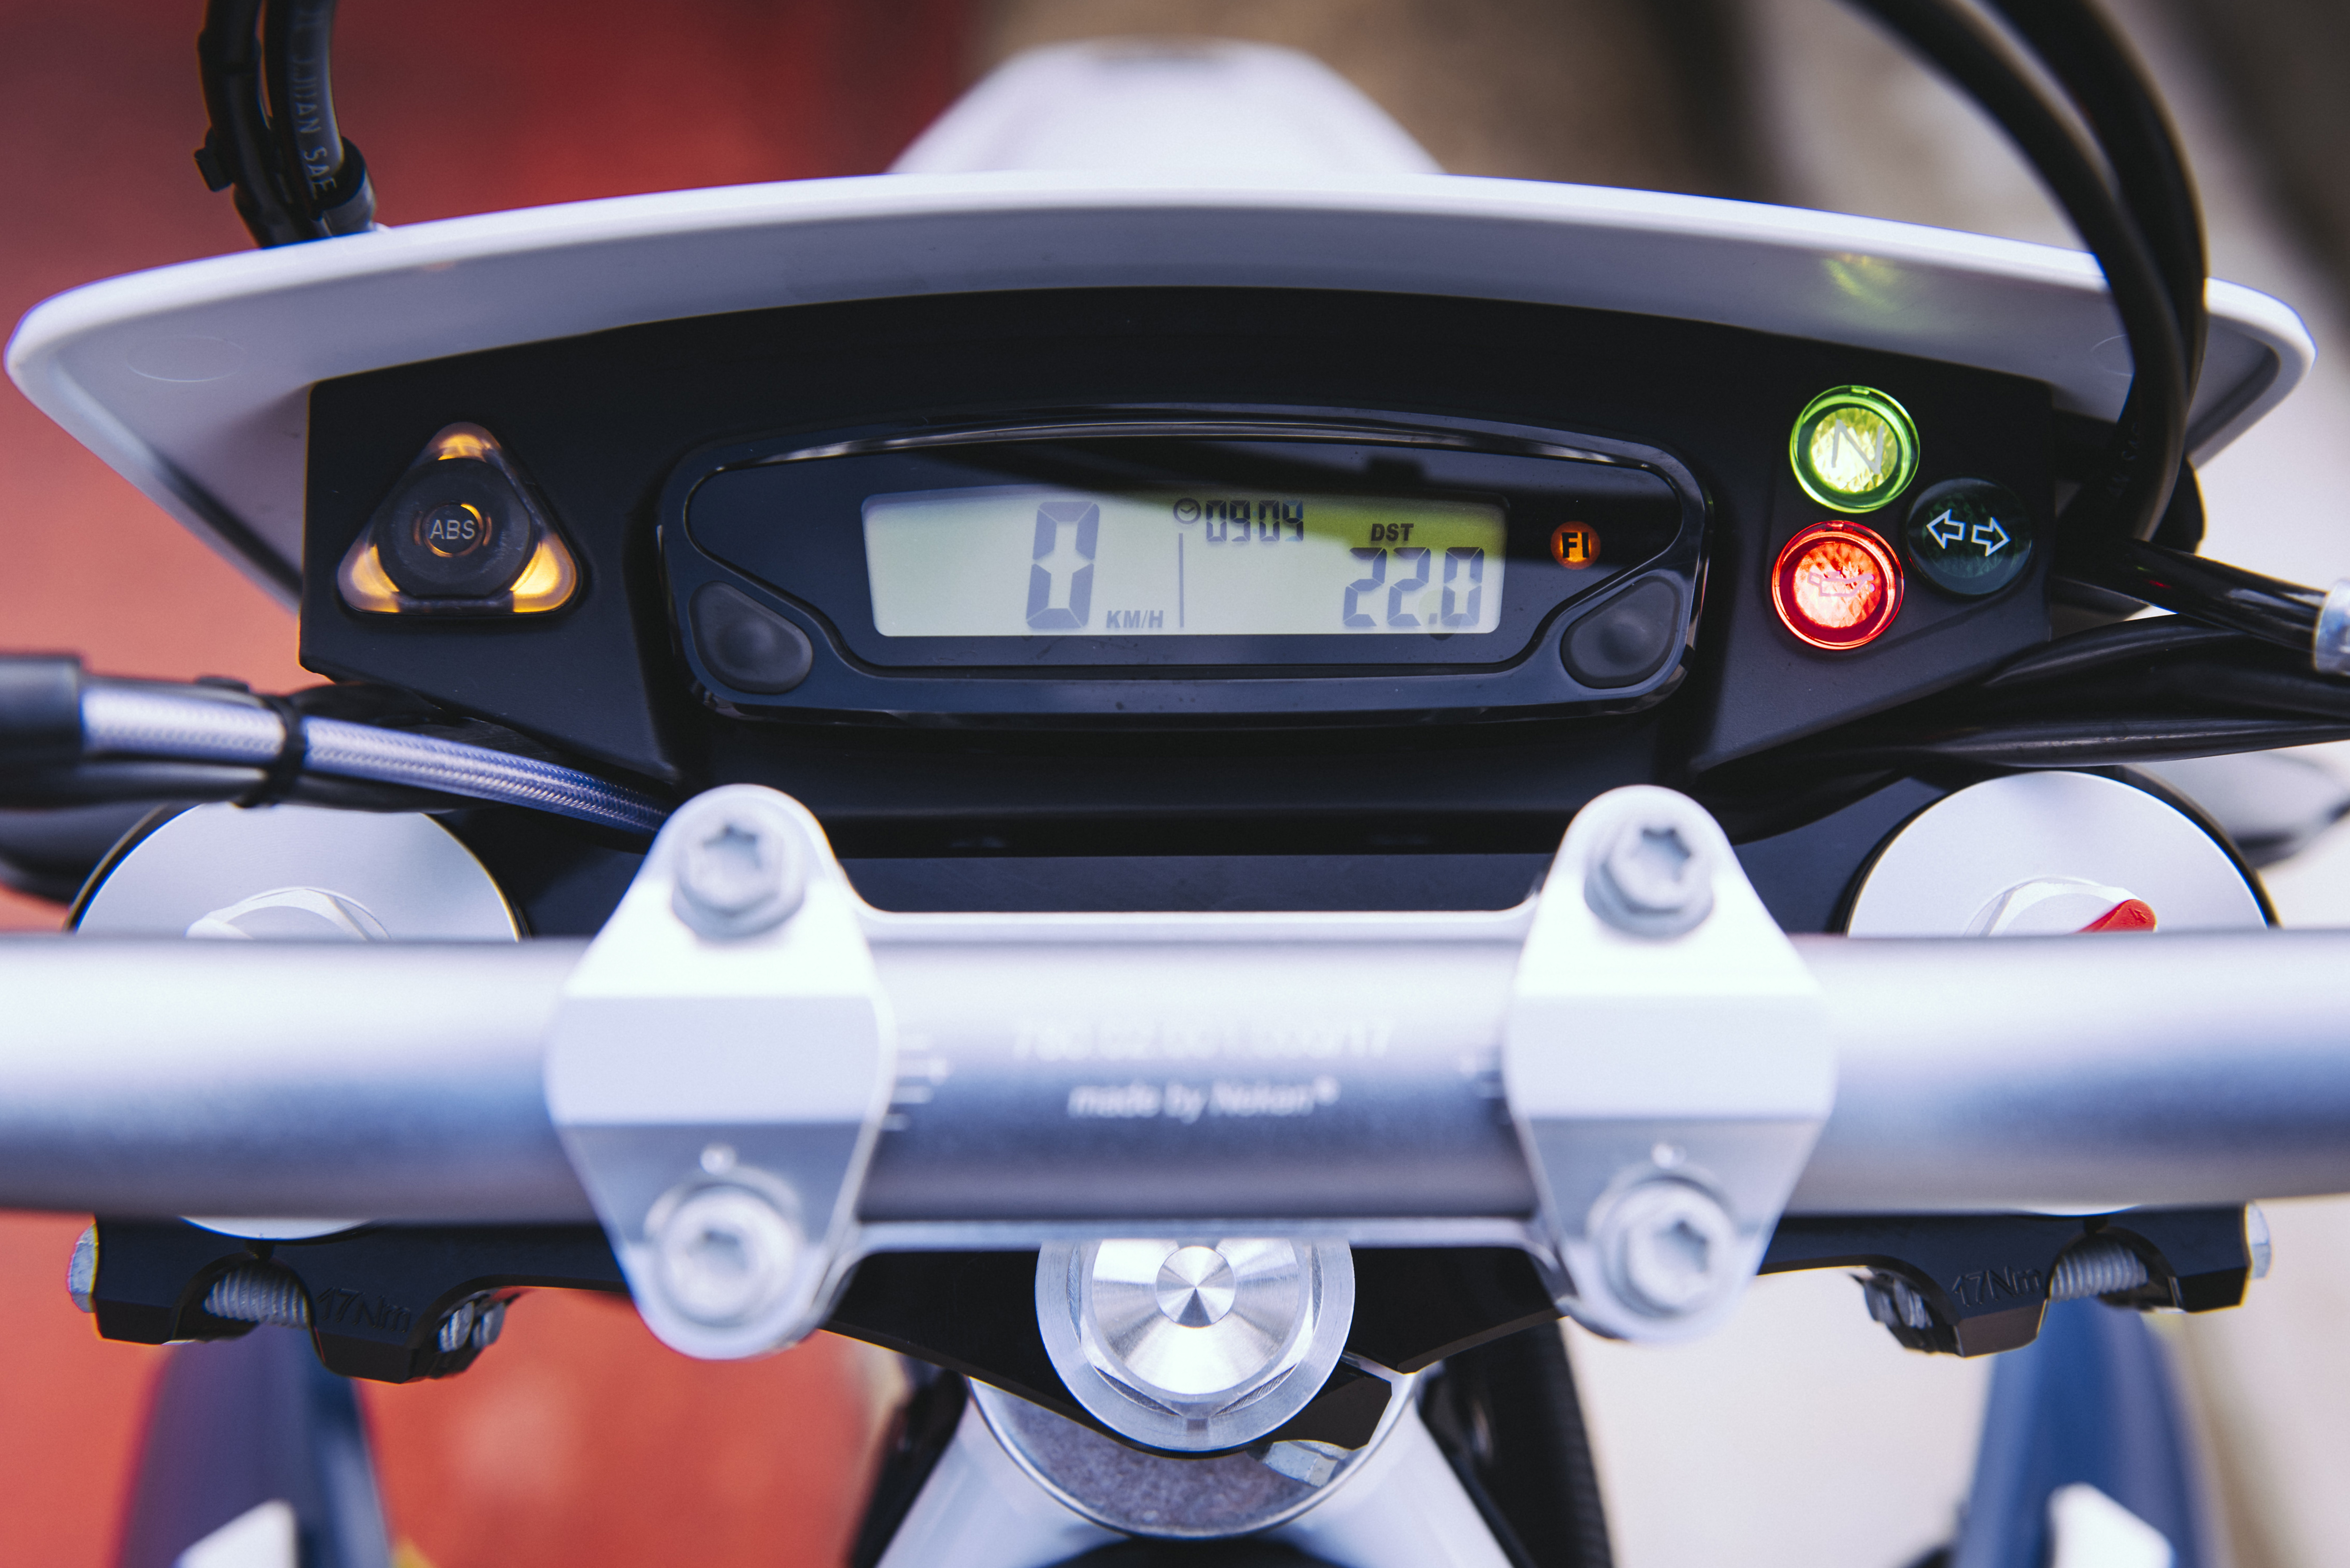 First Ride Husqvarna 701 Supermoto Review Visordown